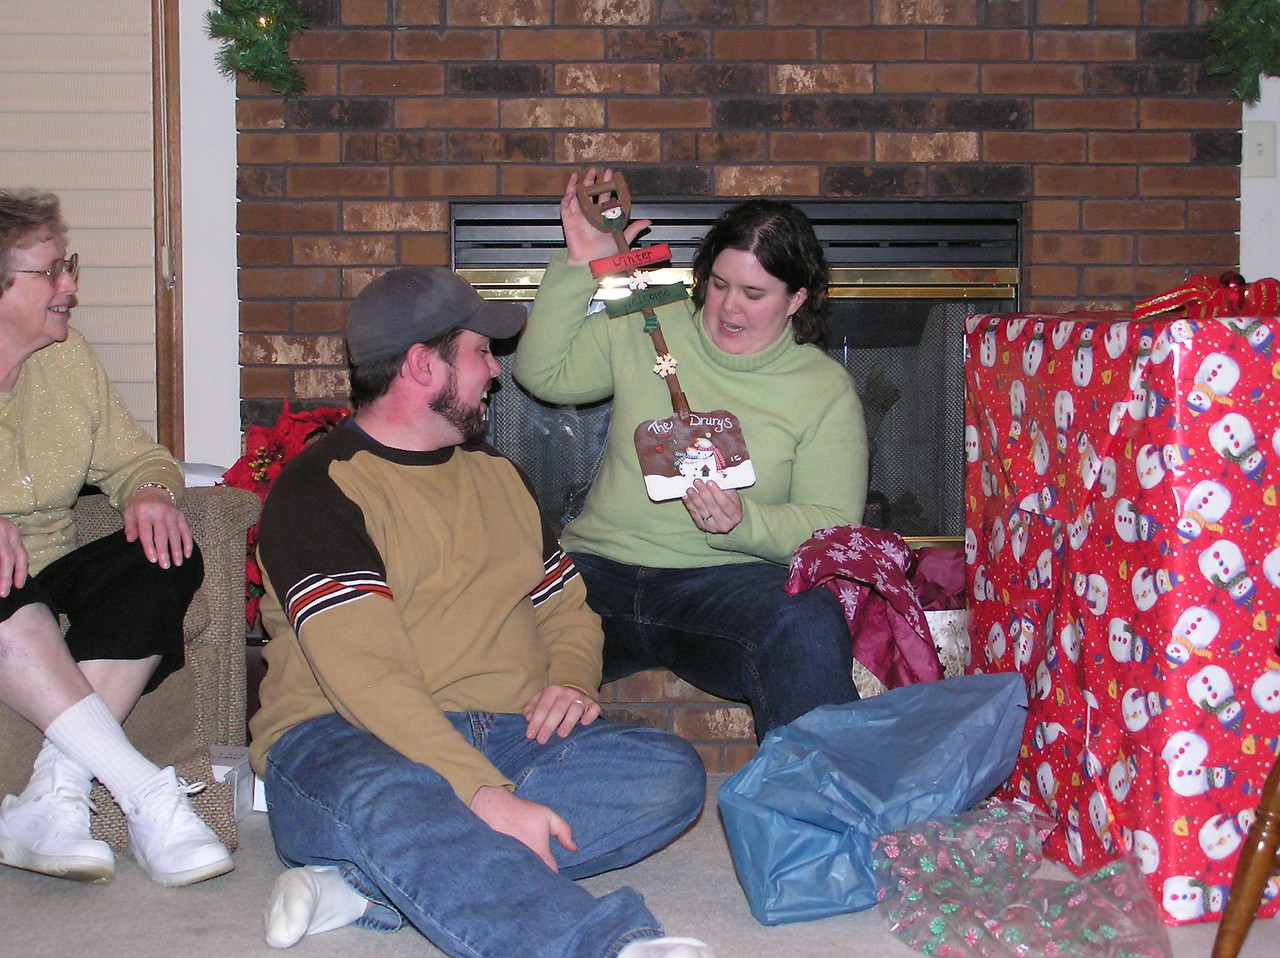 Christmas with the Kids - 12/26/05